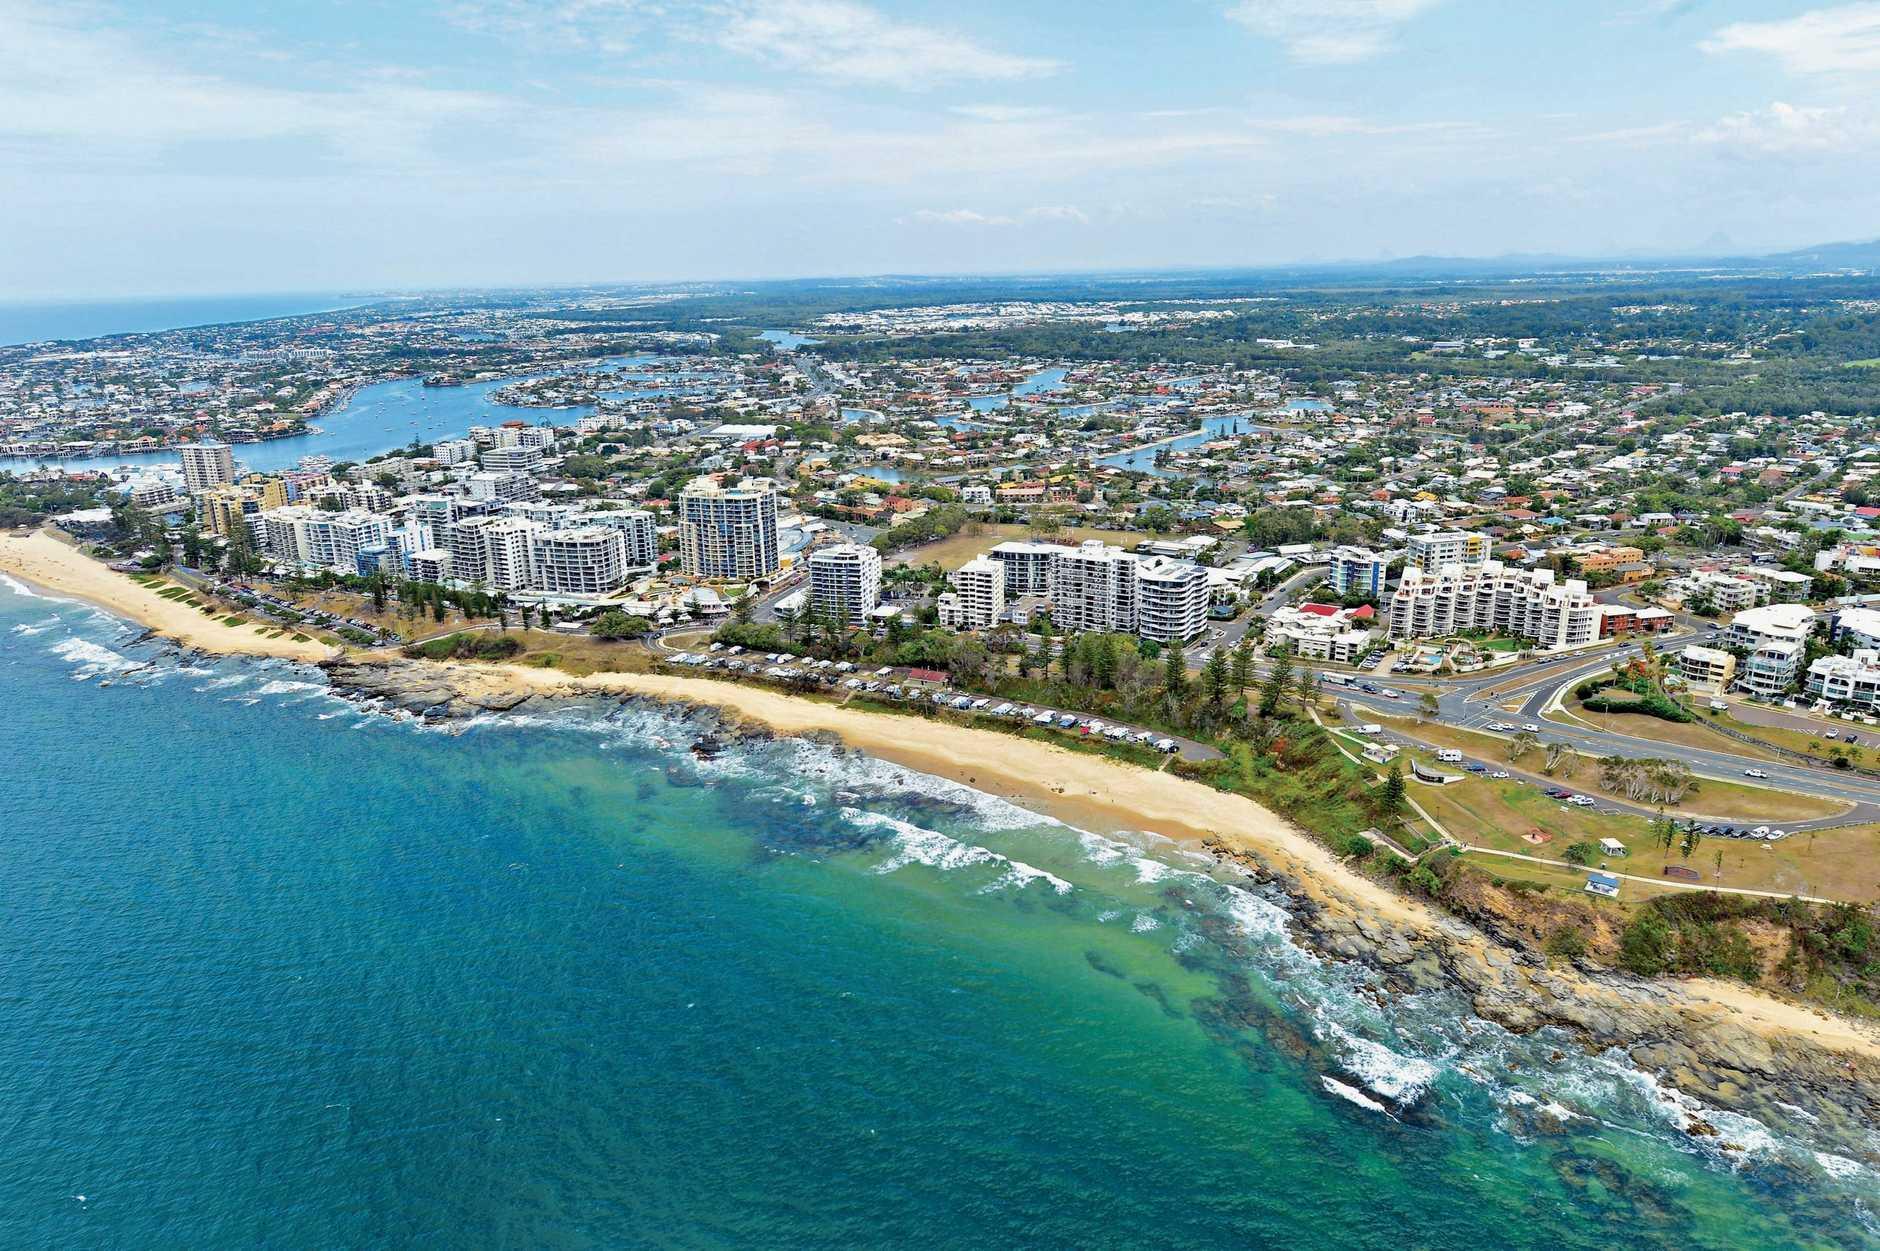 Aerial photographs of the Sunshine Coast. Alexandra Parade. Mooloolaba Caravan Park. Mooloolaba Beach. Alexandra Headland.